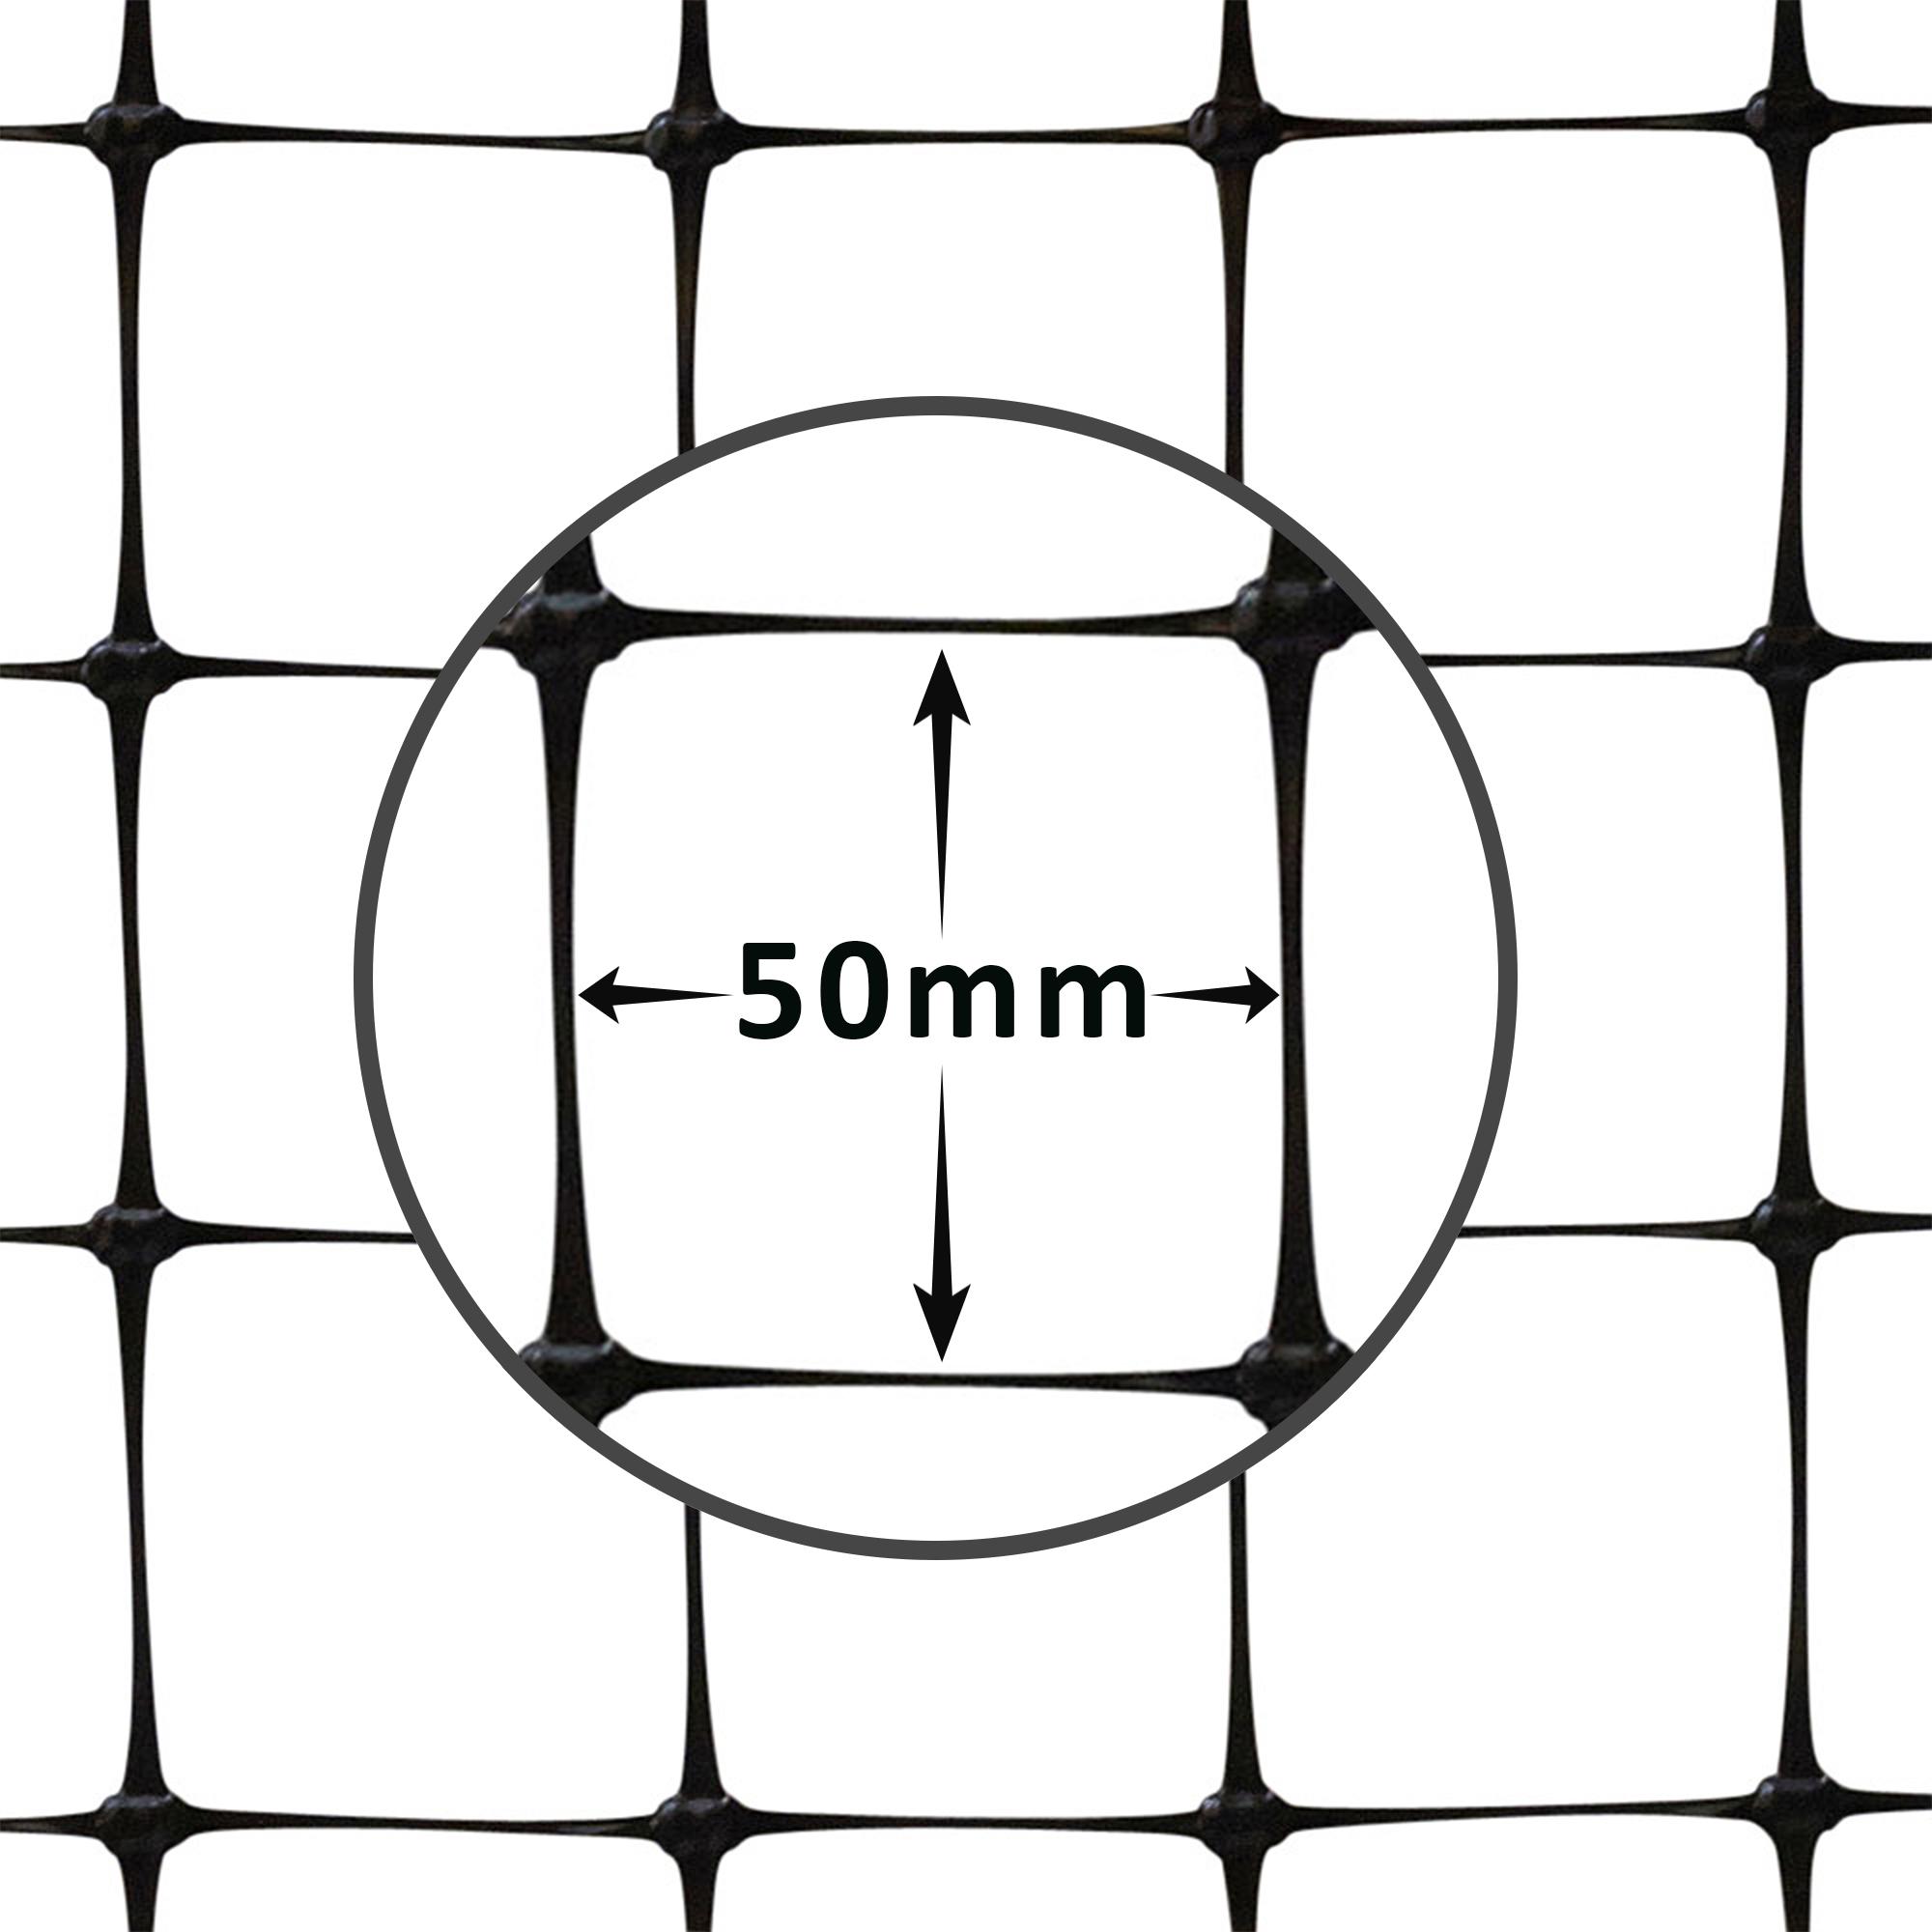 deer-fence-hole-size-50mm